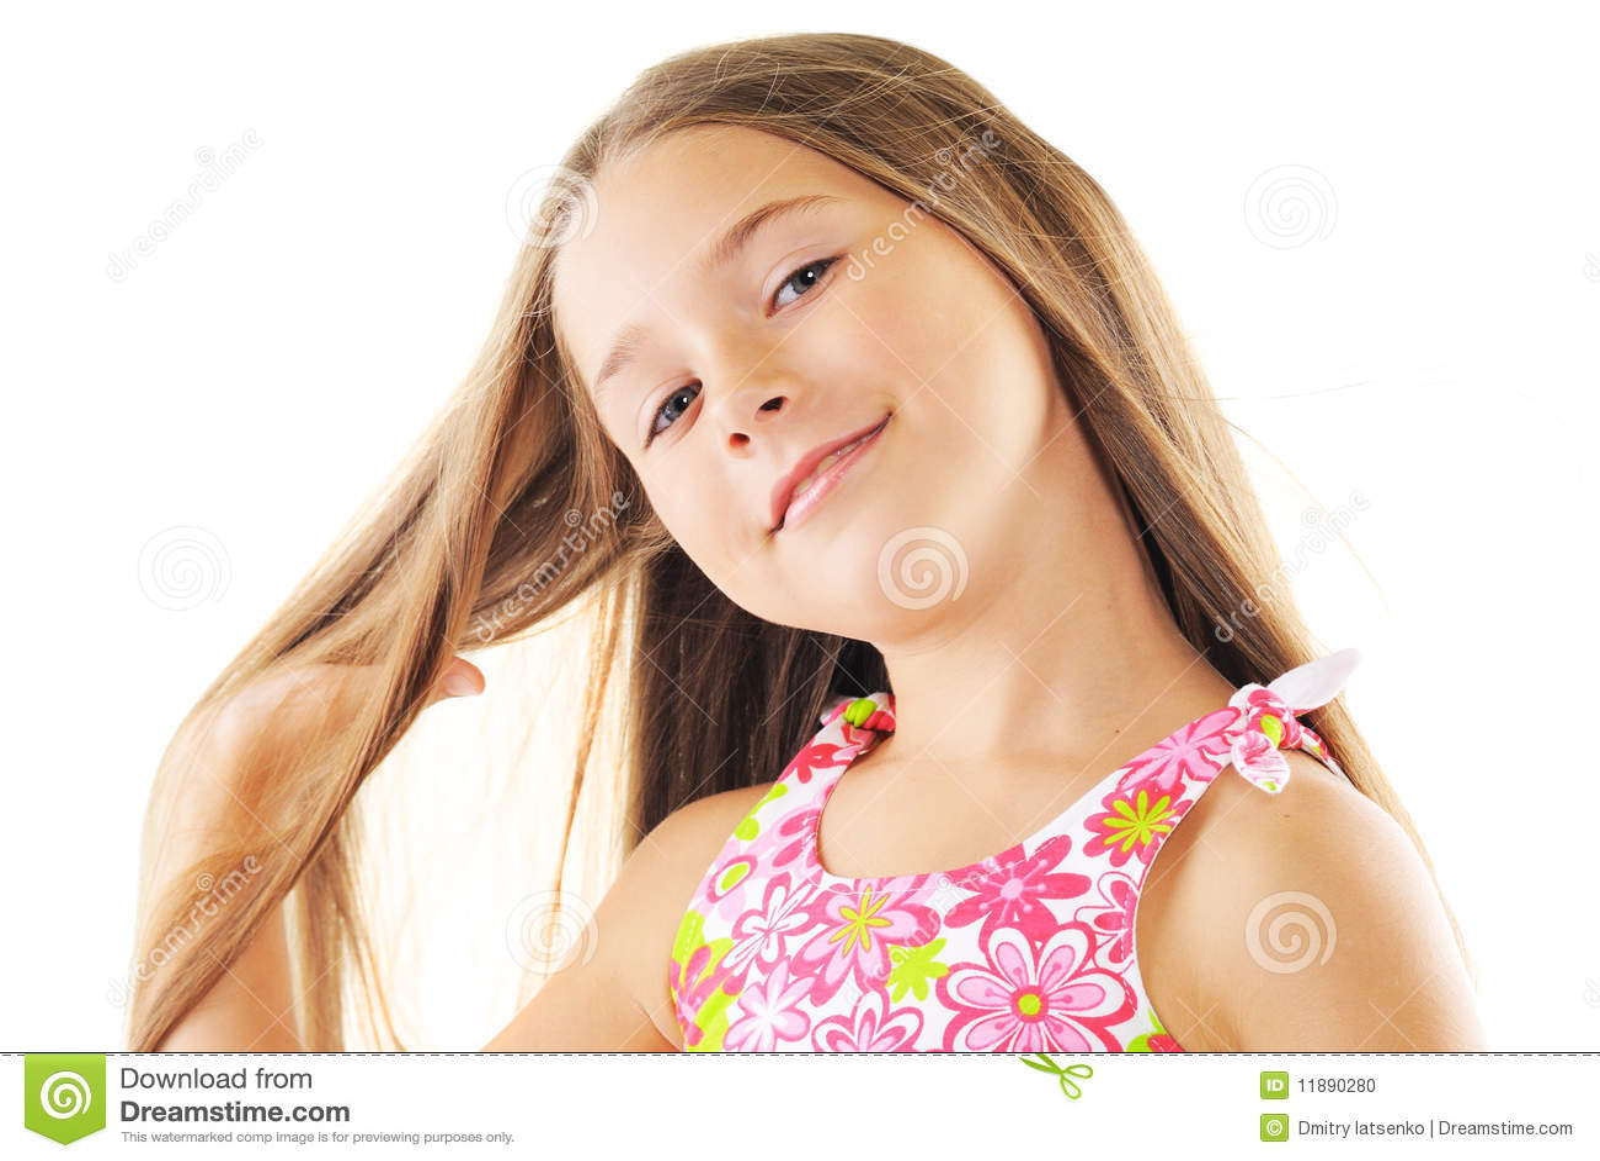 Helder portret van blond klein meisje op wit stock foto afbeelding 11890280 - Kleine teen indelingen meisje ...